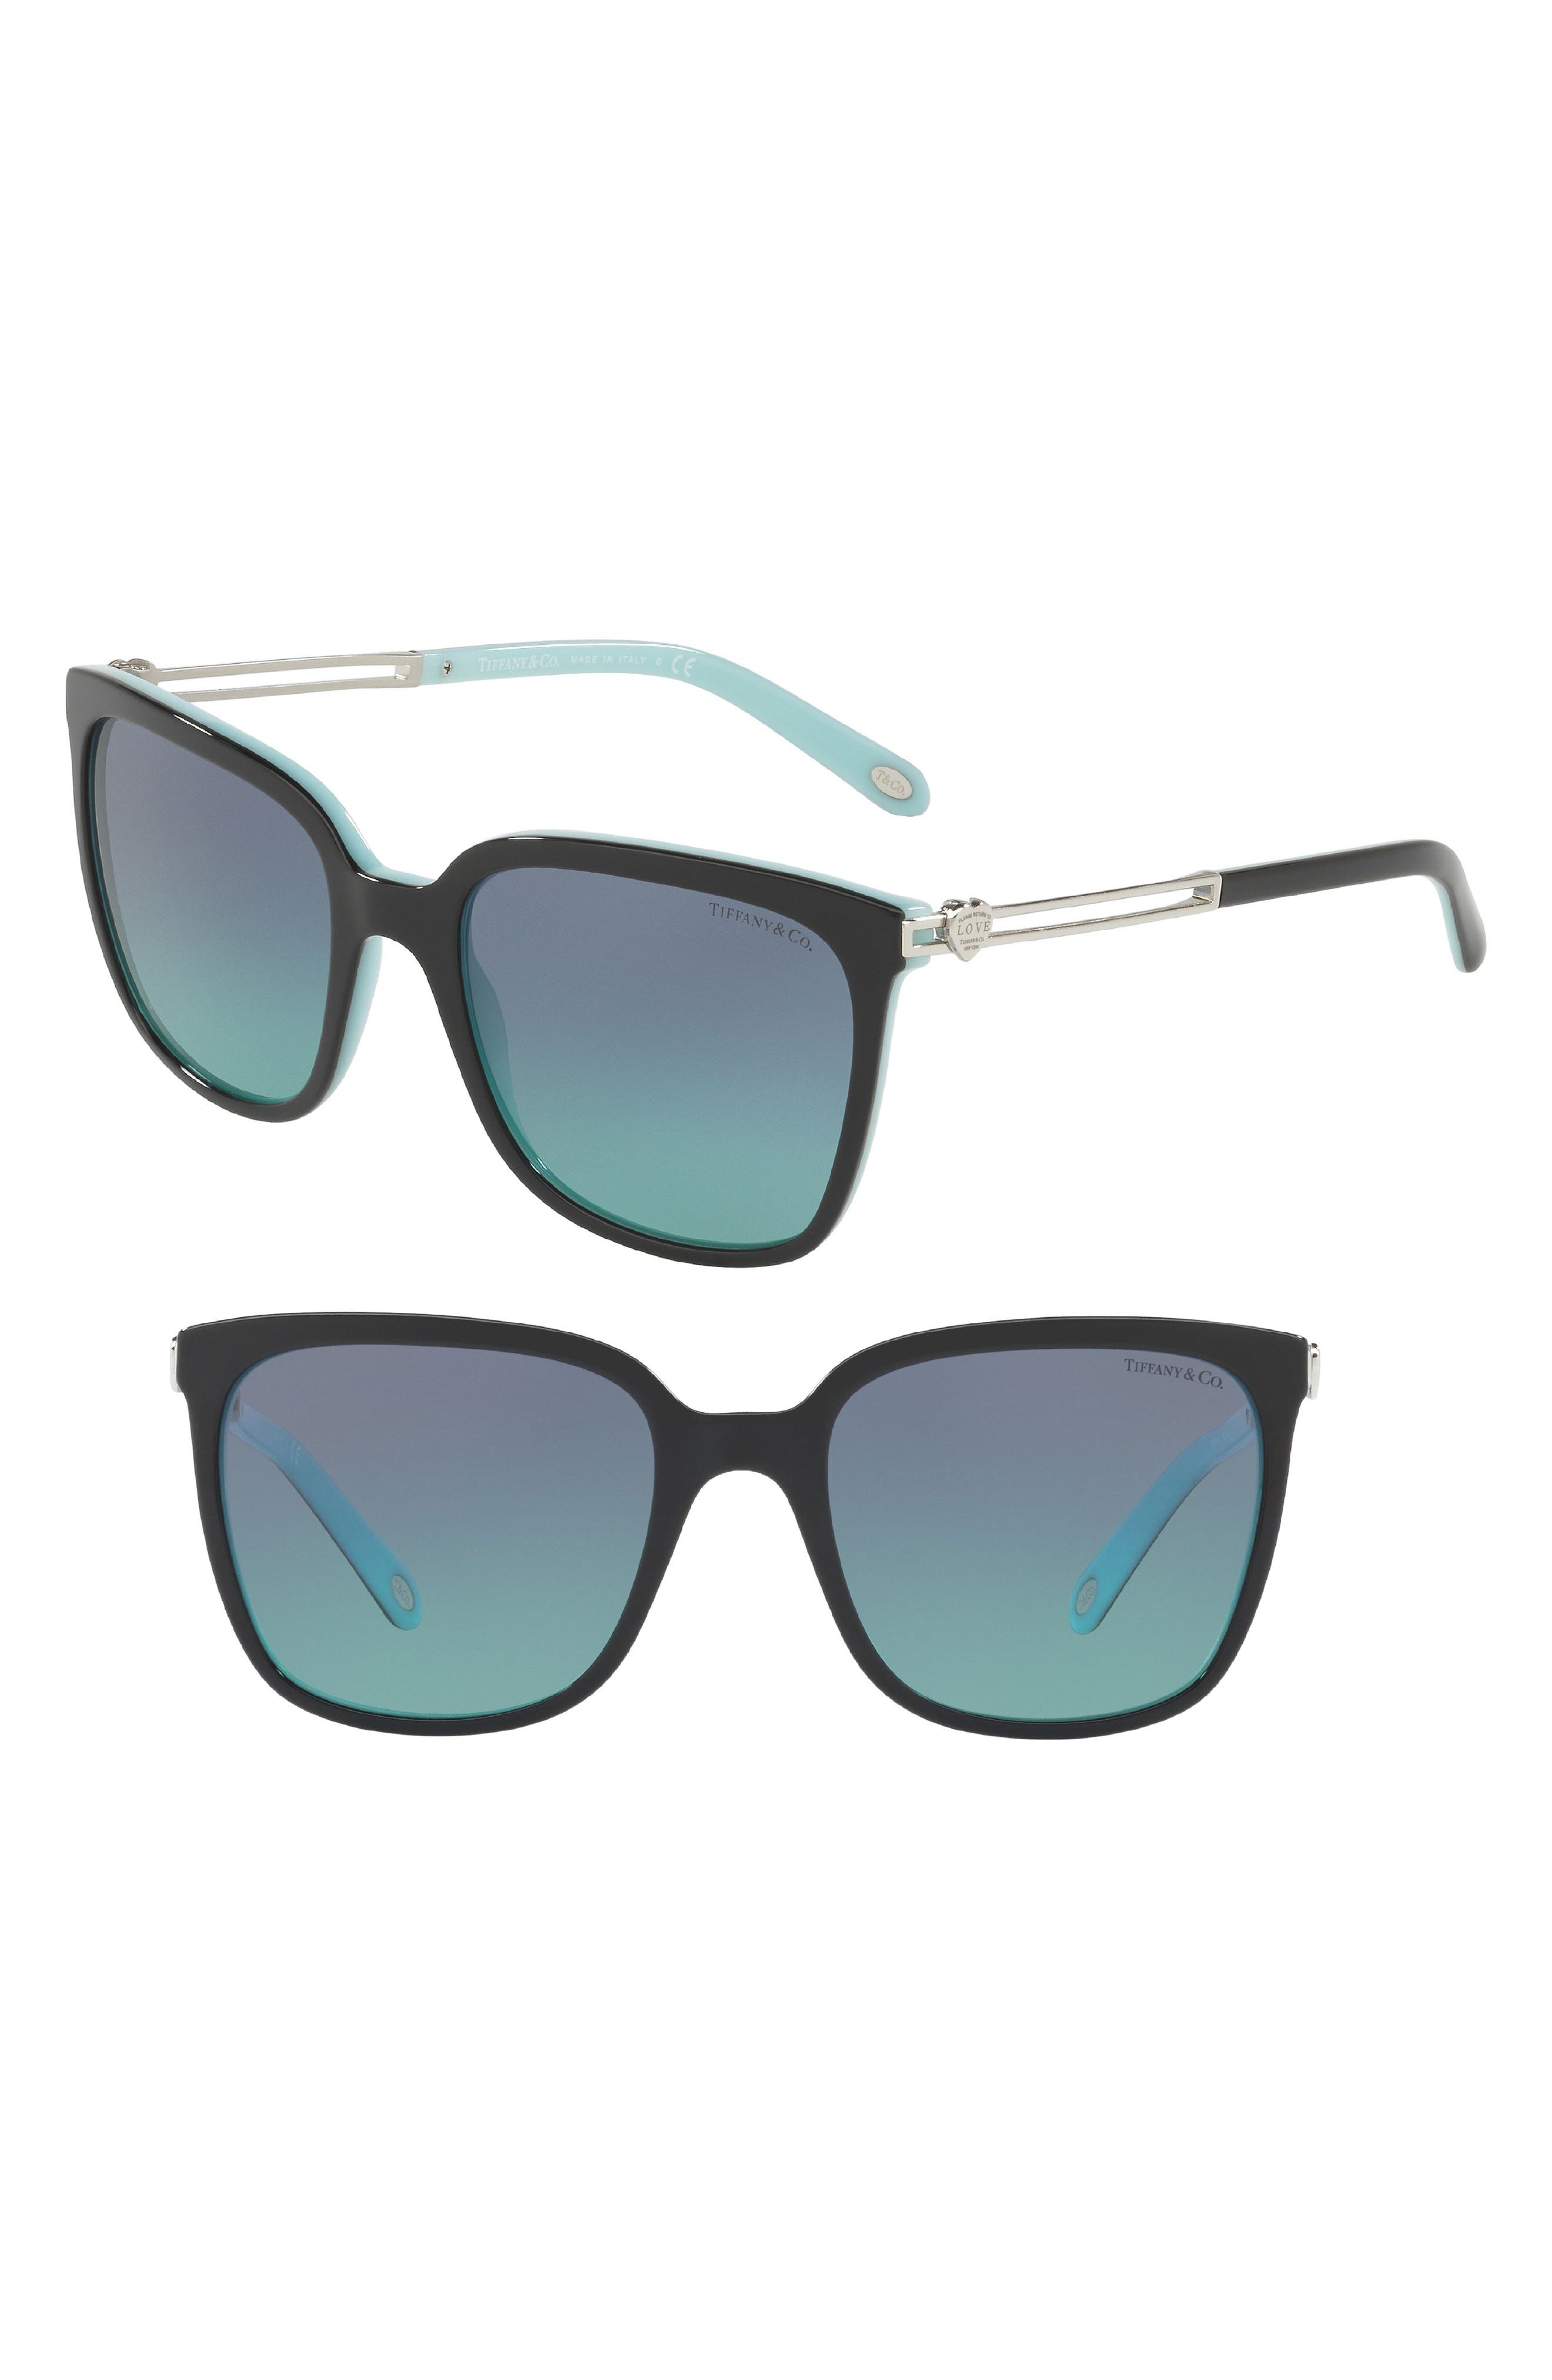 Tiffany 54mm Sunglasses,                             Main thumbnail 1, color,                             BLACK/ BLUE GRADIENT